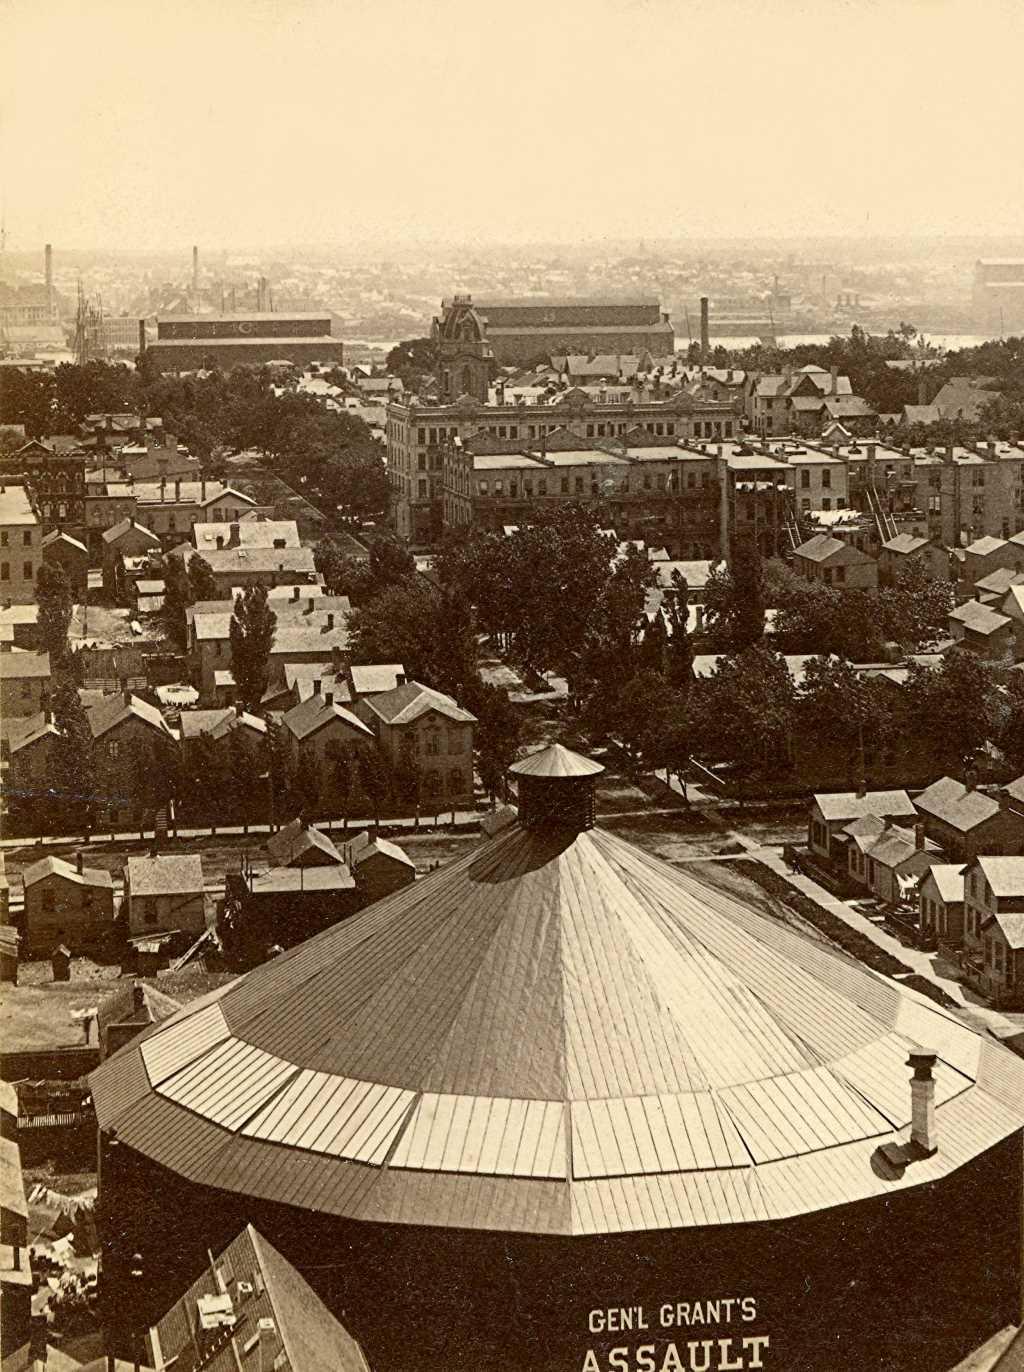 Panorama of Milwaukee, 1885. Image courtesy of Jeff Beutner.